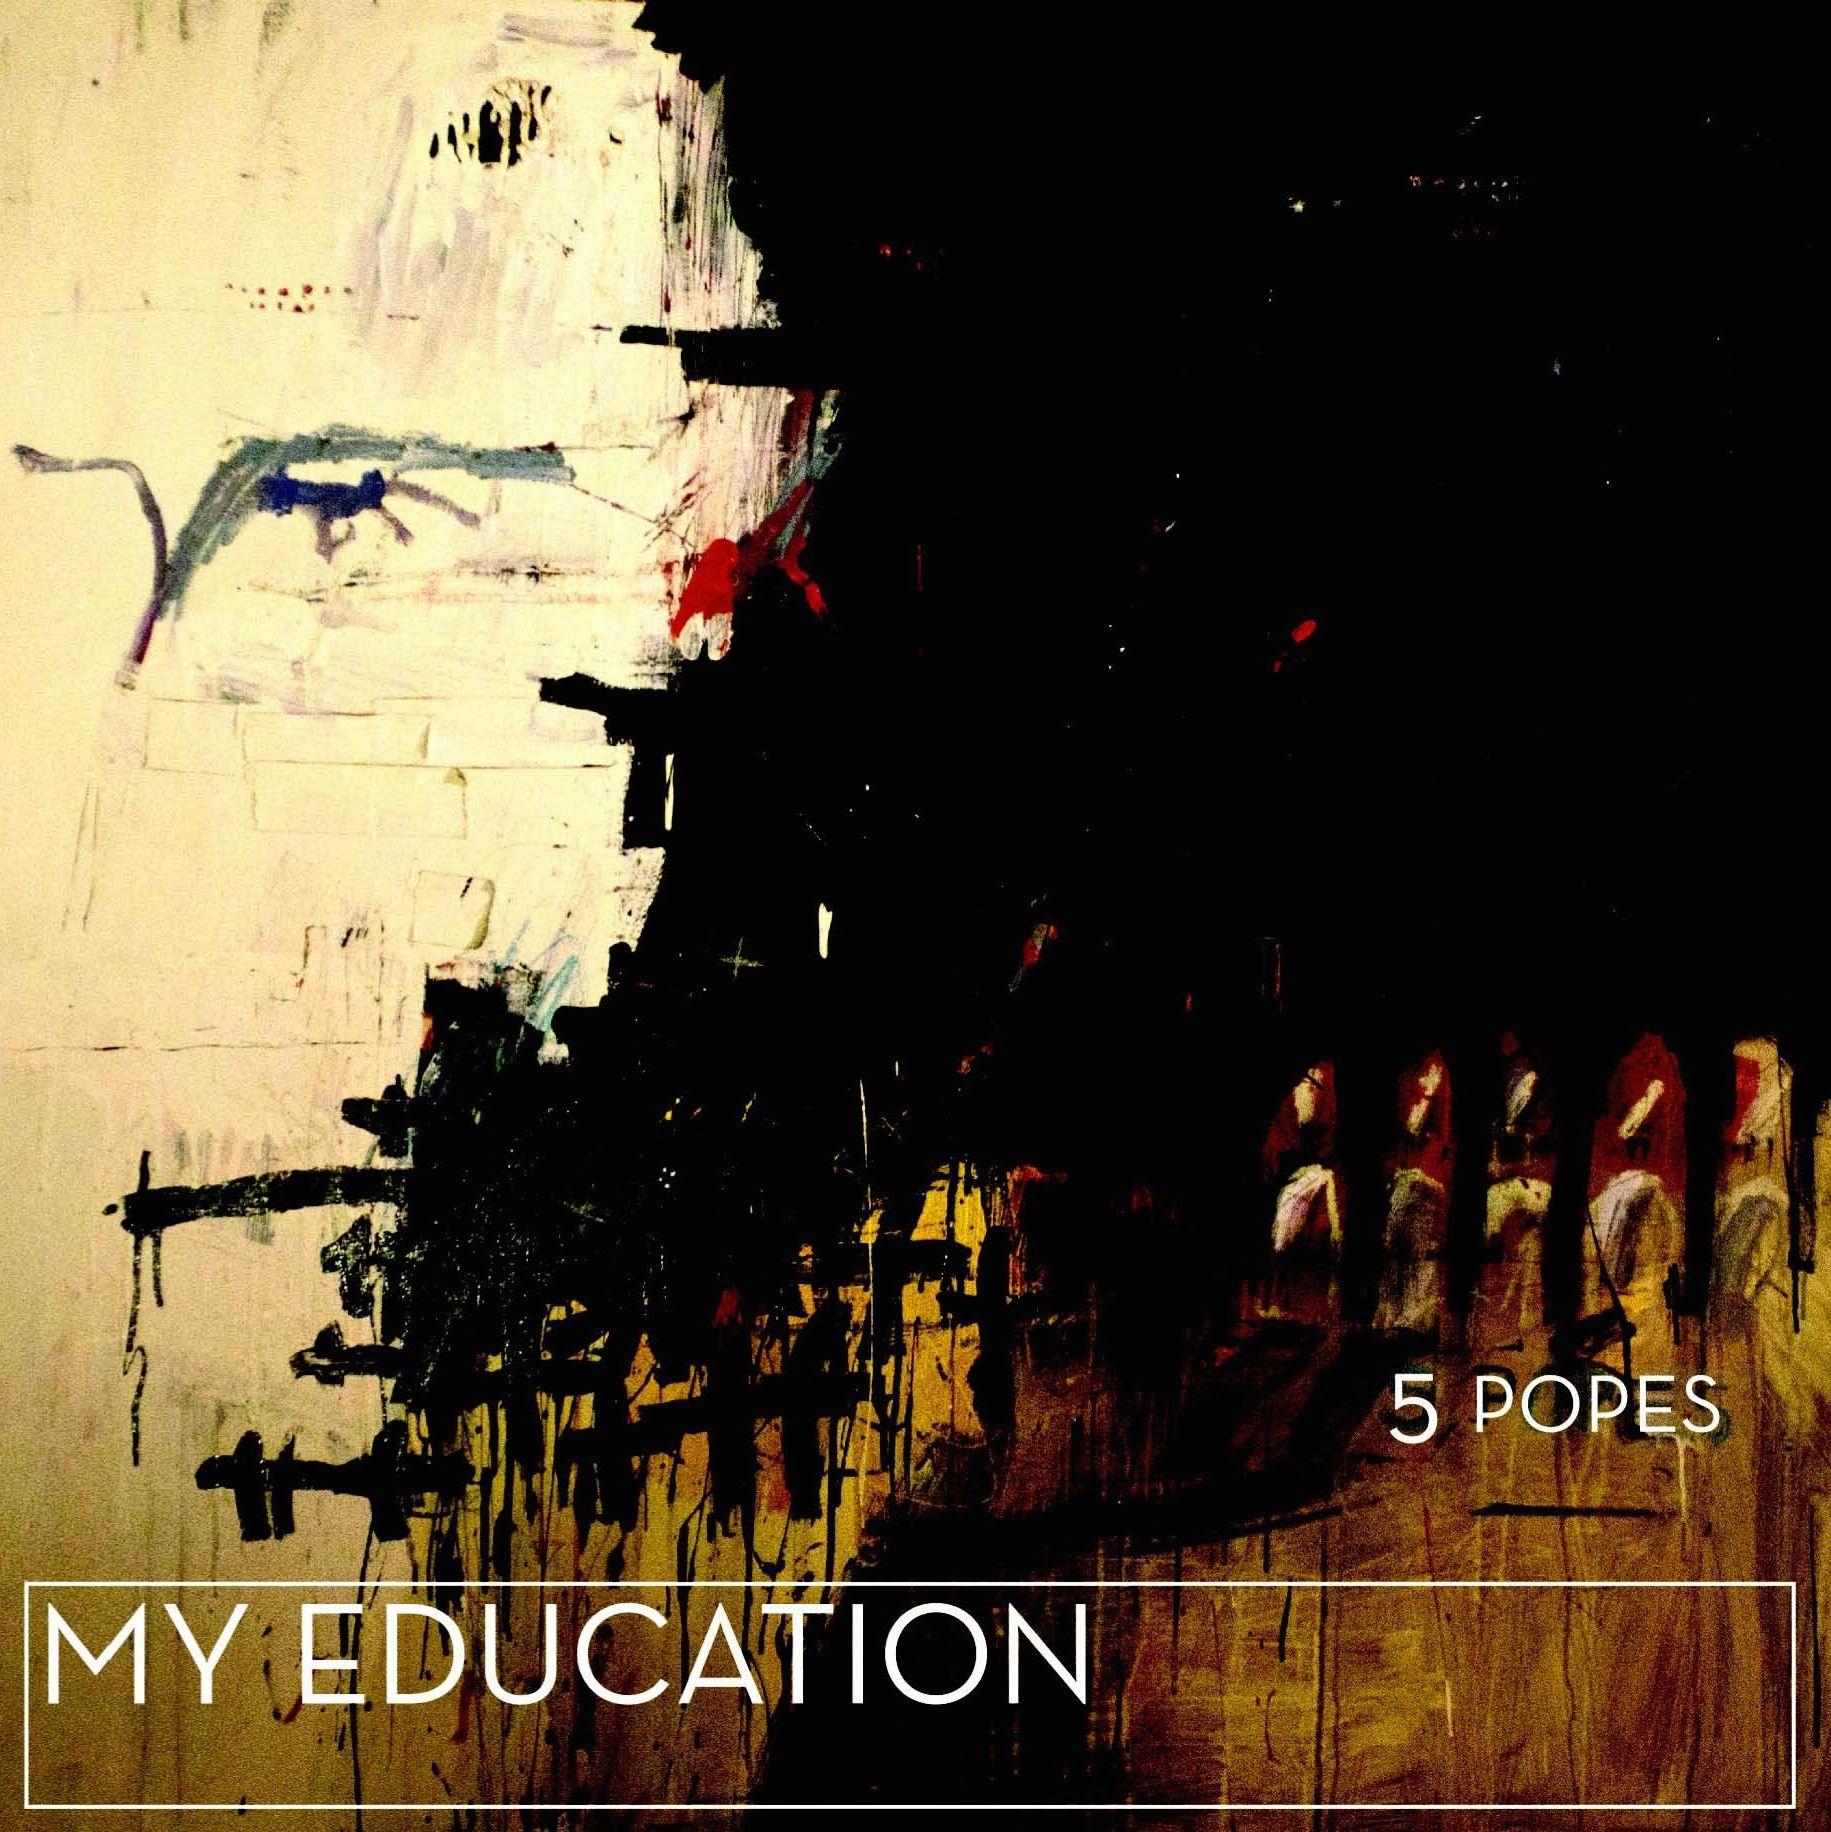 my education - 5 popes